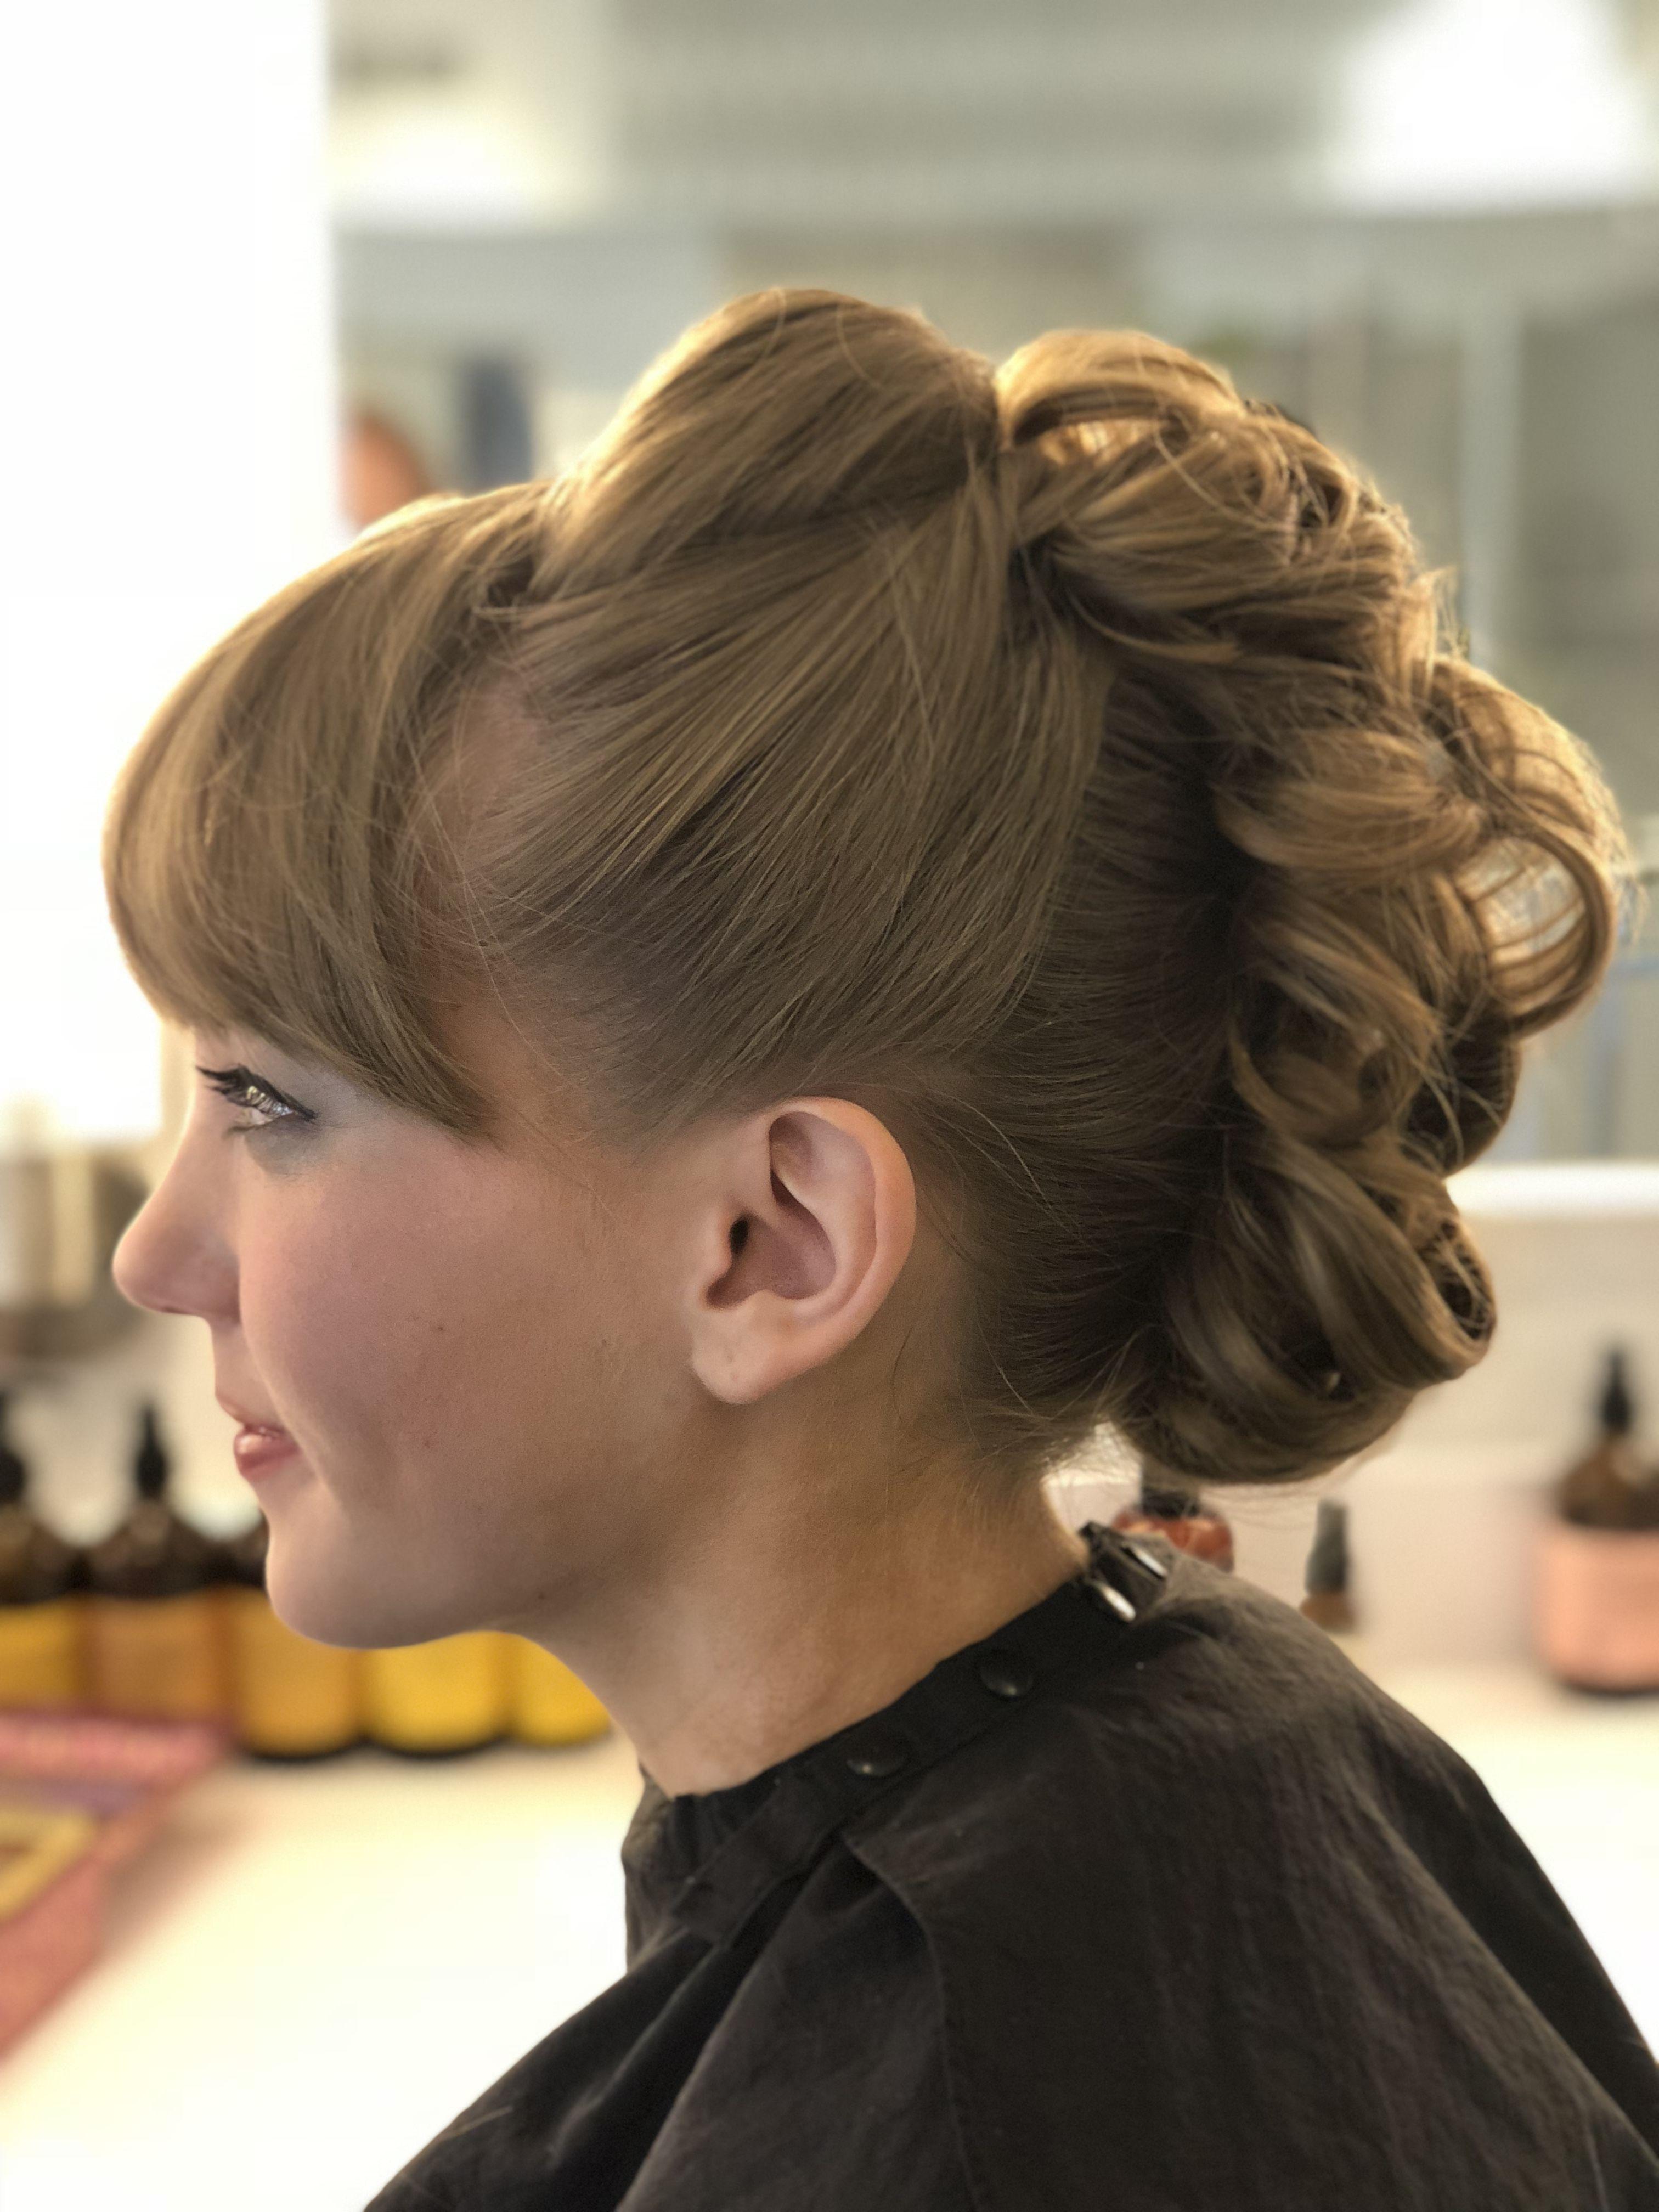 Prom style updo mohawk hair maureenus marvelous makeovers